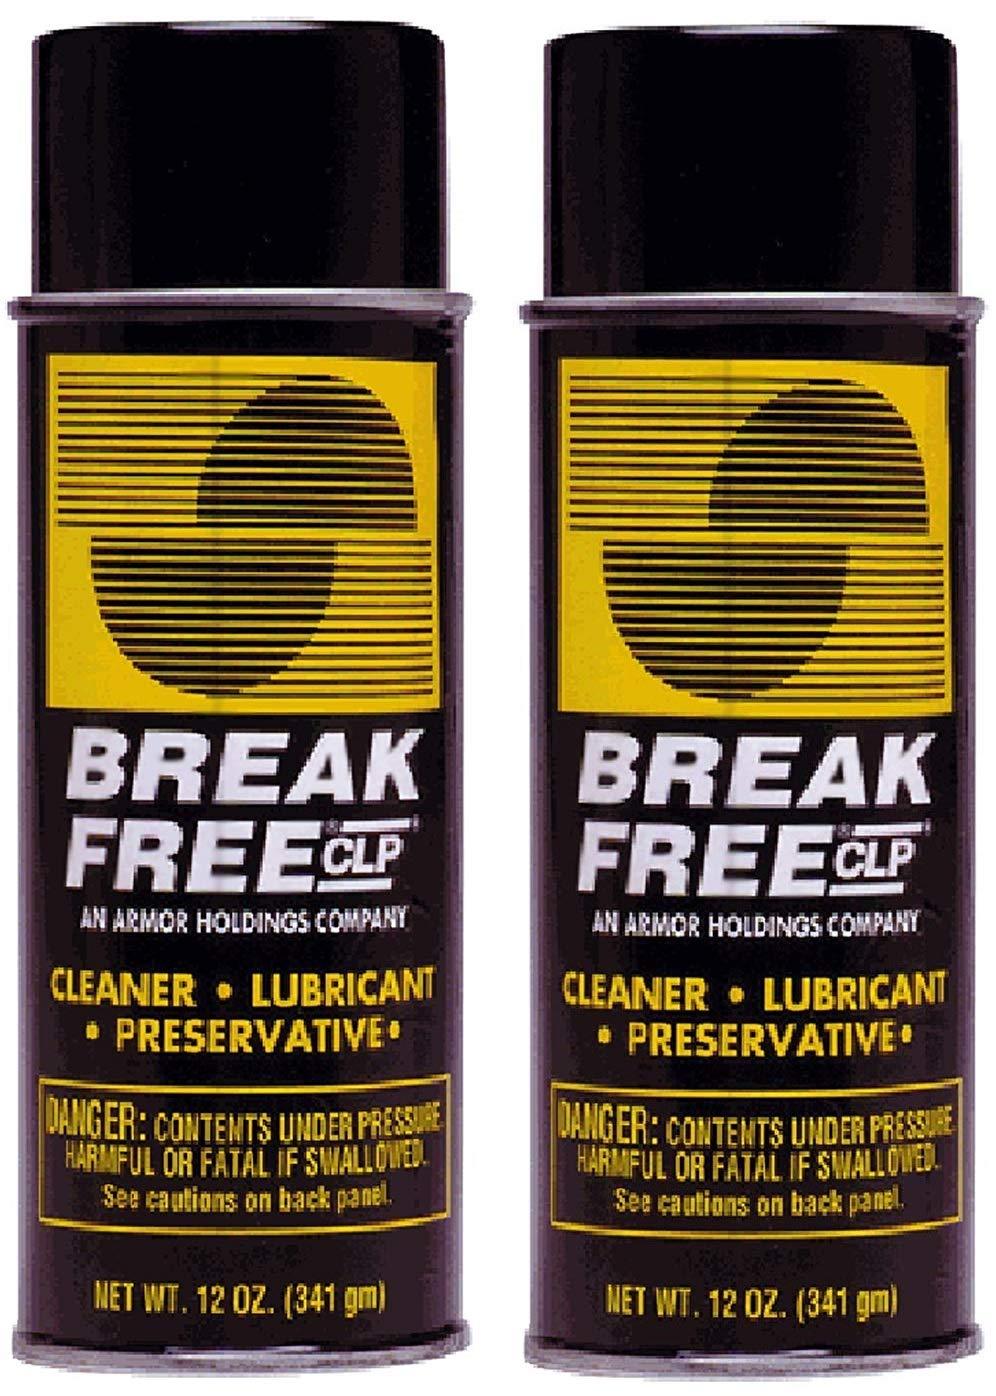 BreakFree CLP Gun Cleans Lubricates Prevent Aerosol Can, 12-Ounce/340gm, BF-CLP12 (2-(Pack))